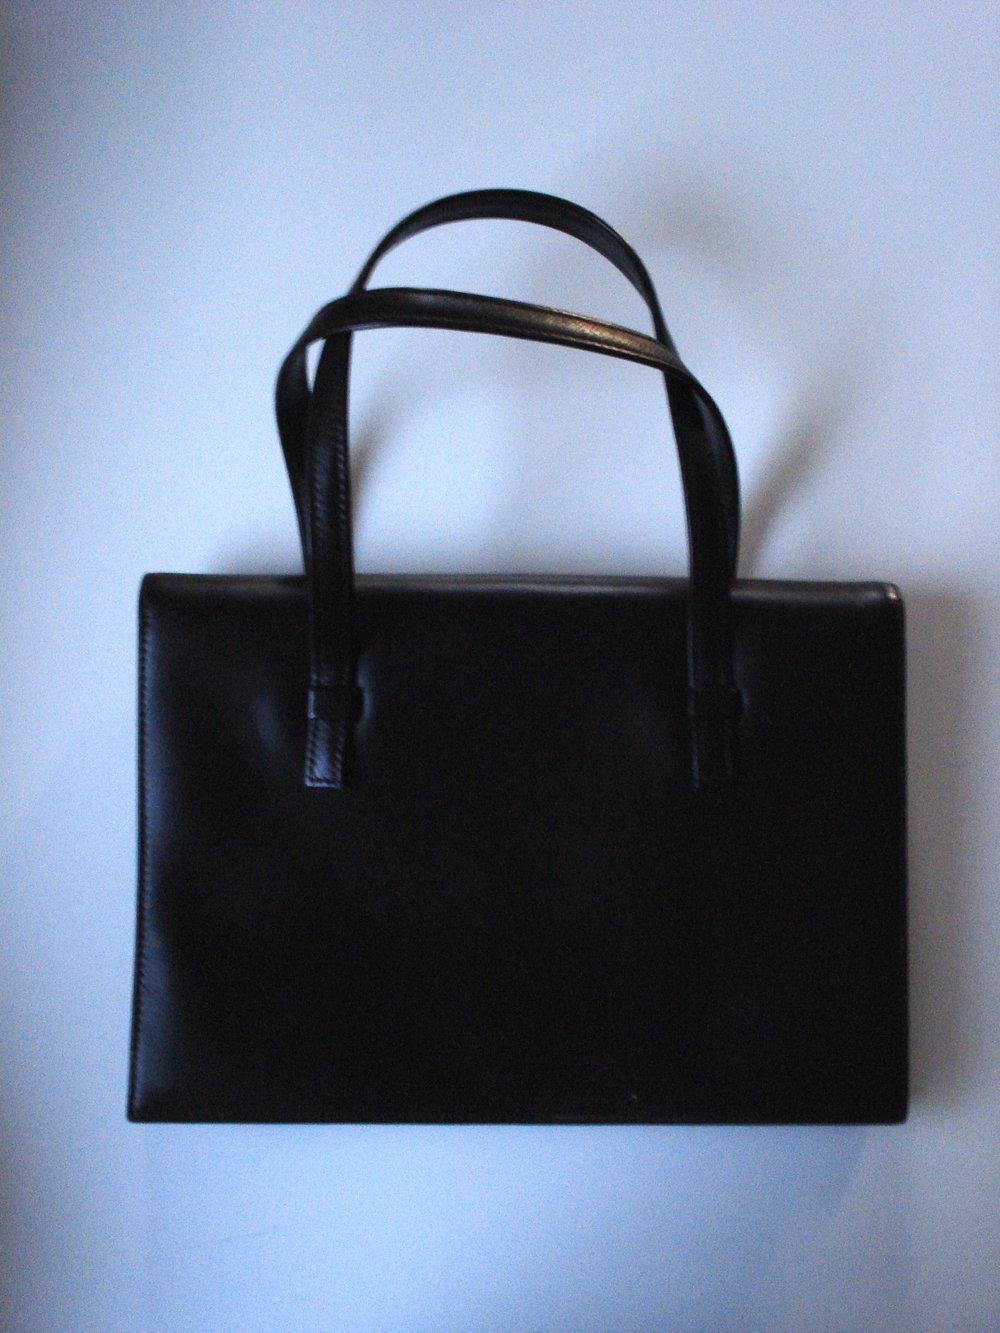 Mode-Design Neueste Mode Rabatt Goldpfeil Handtasche schwarz